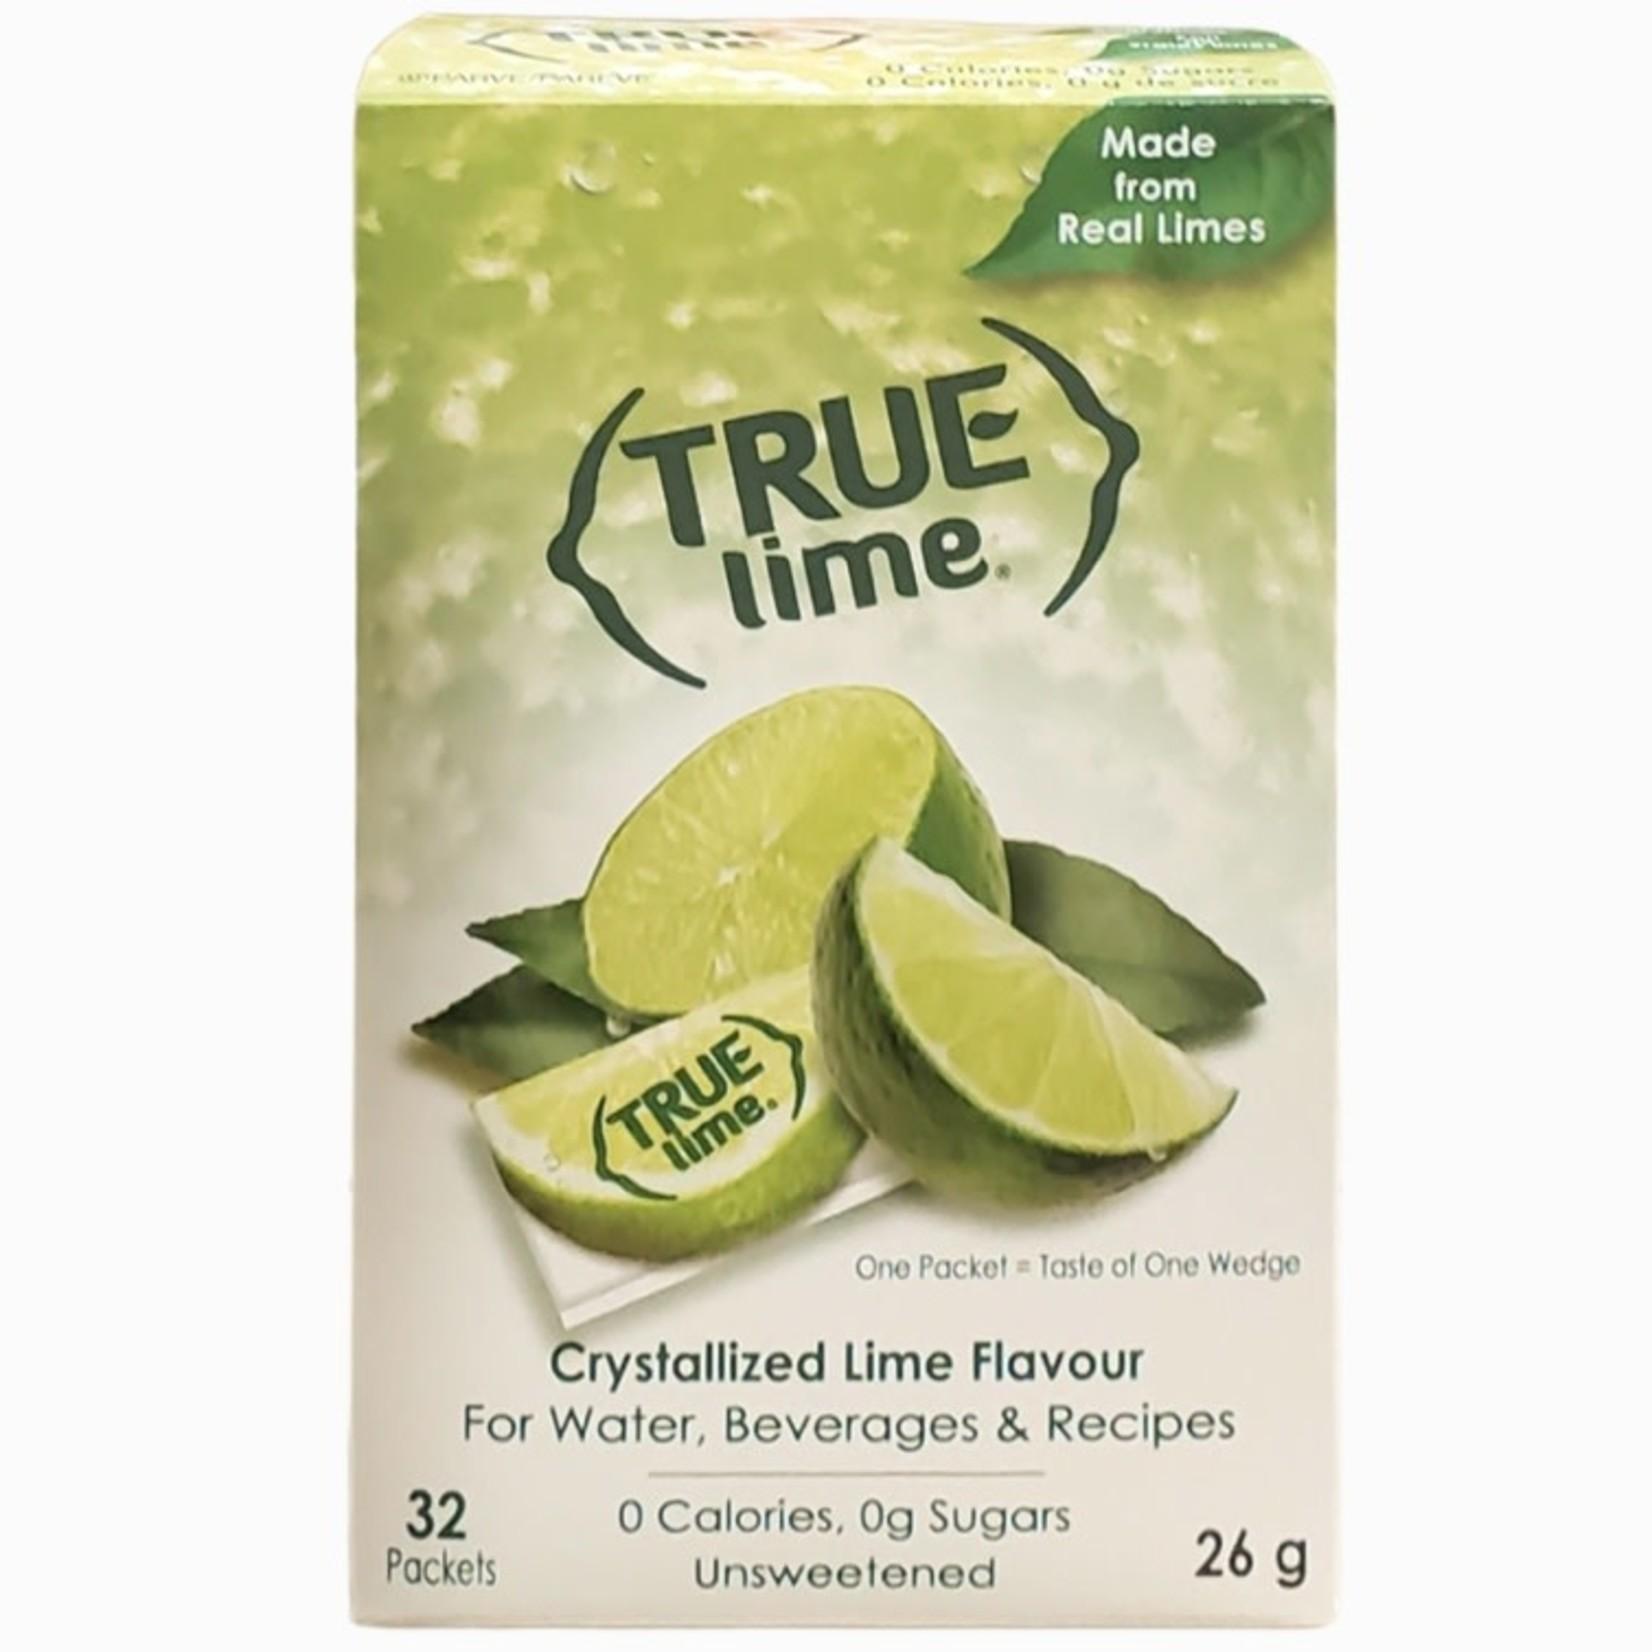 True Citrus True Lime 26g 32 packets